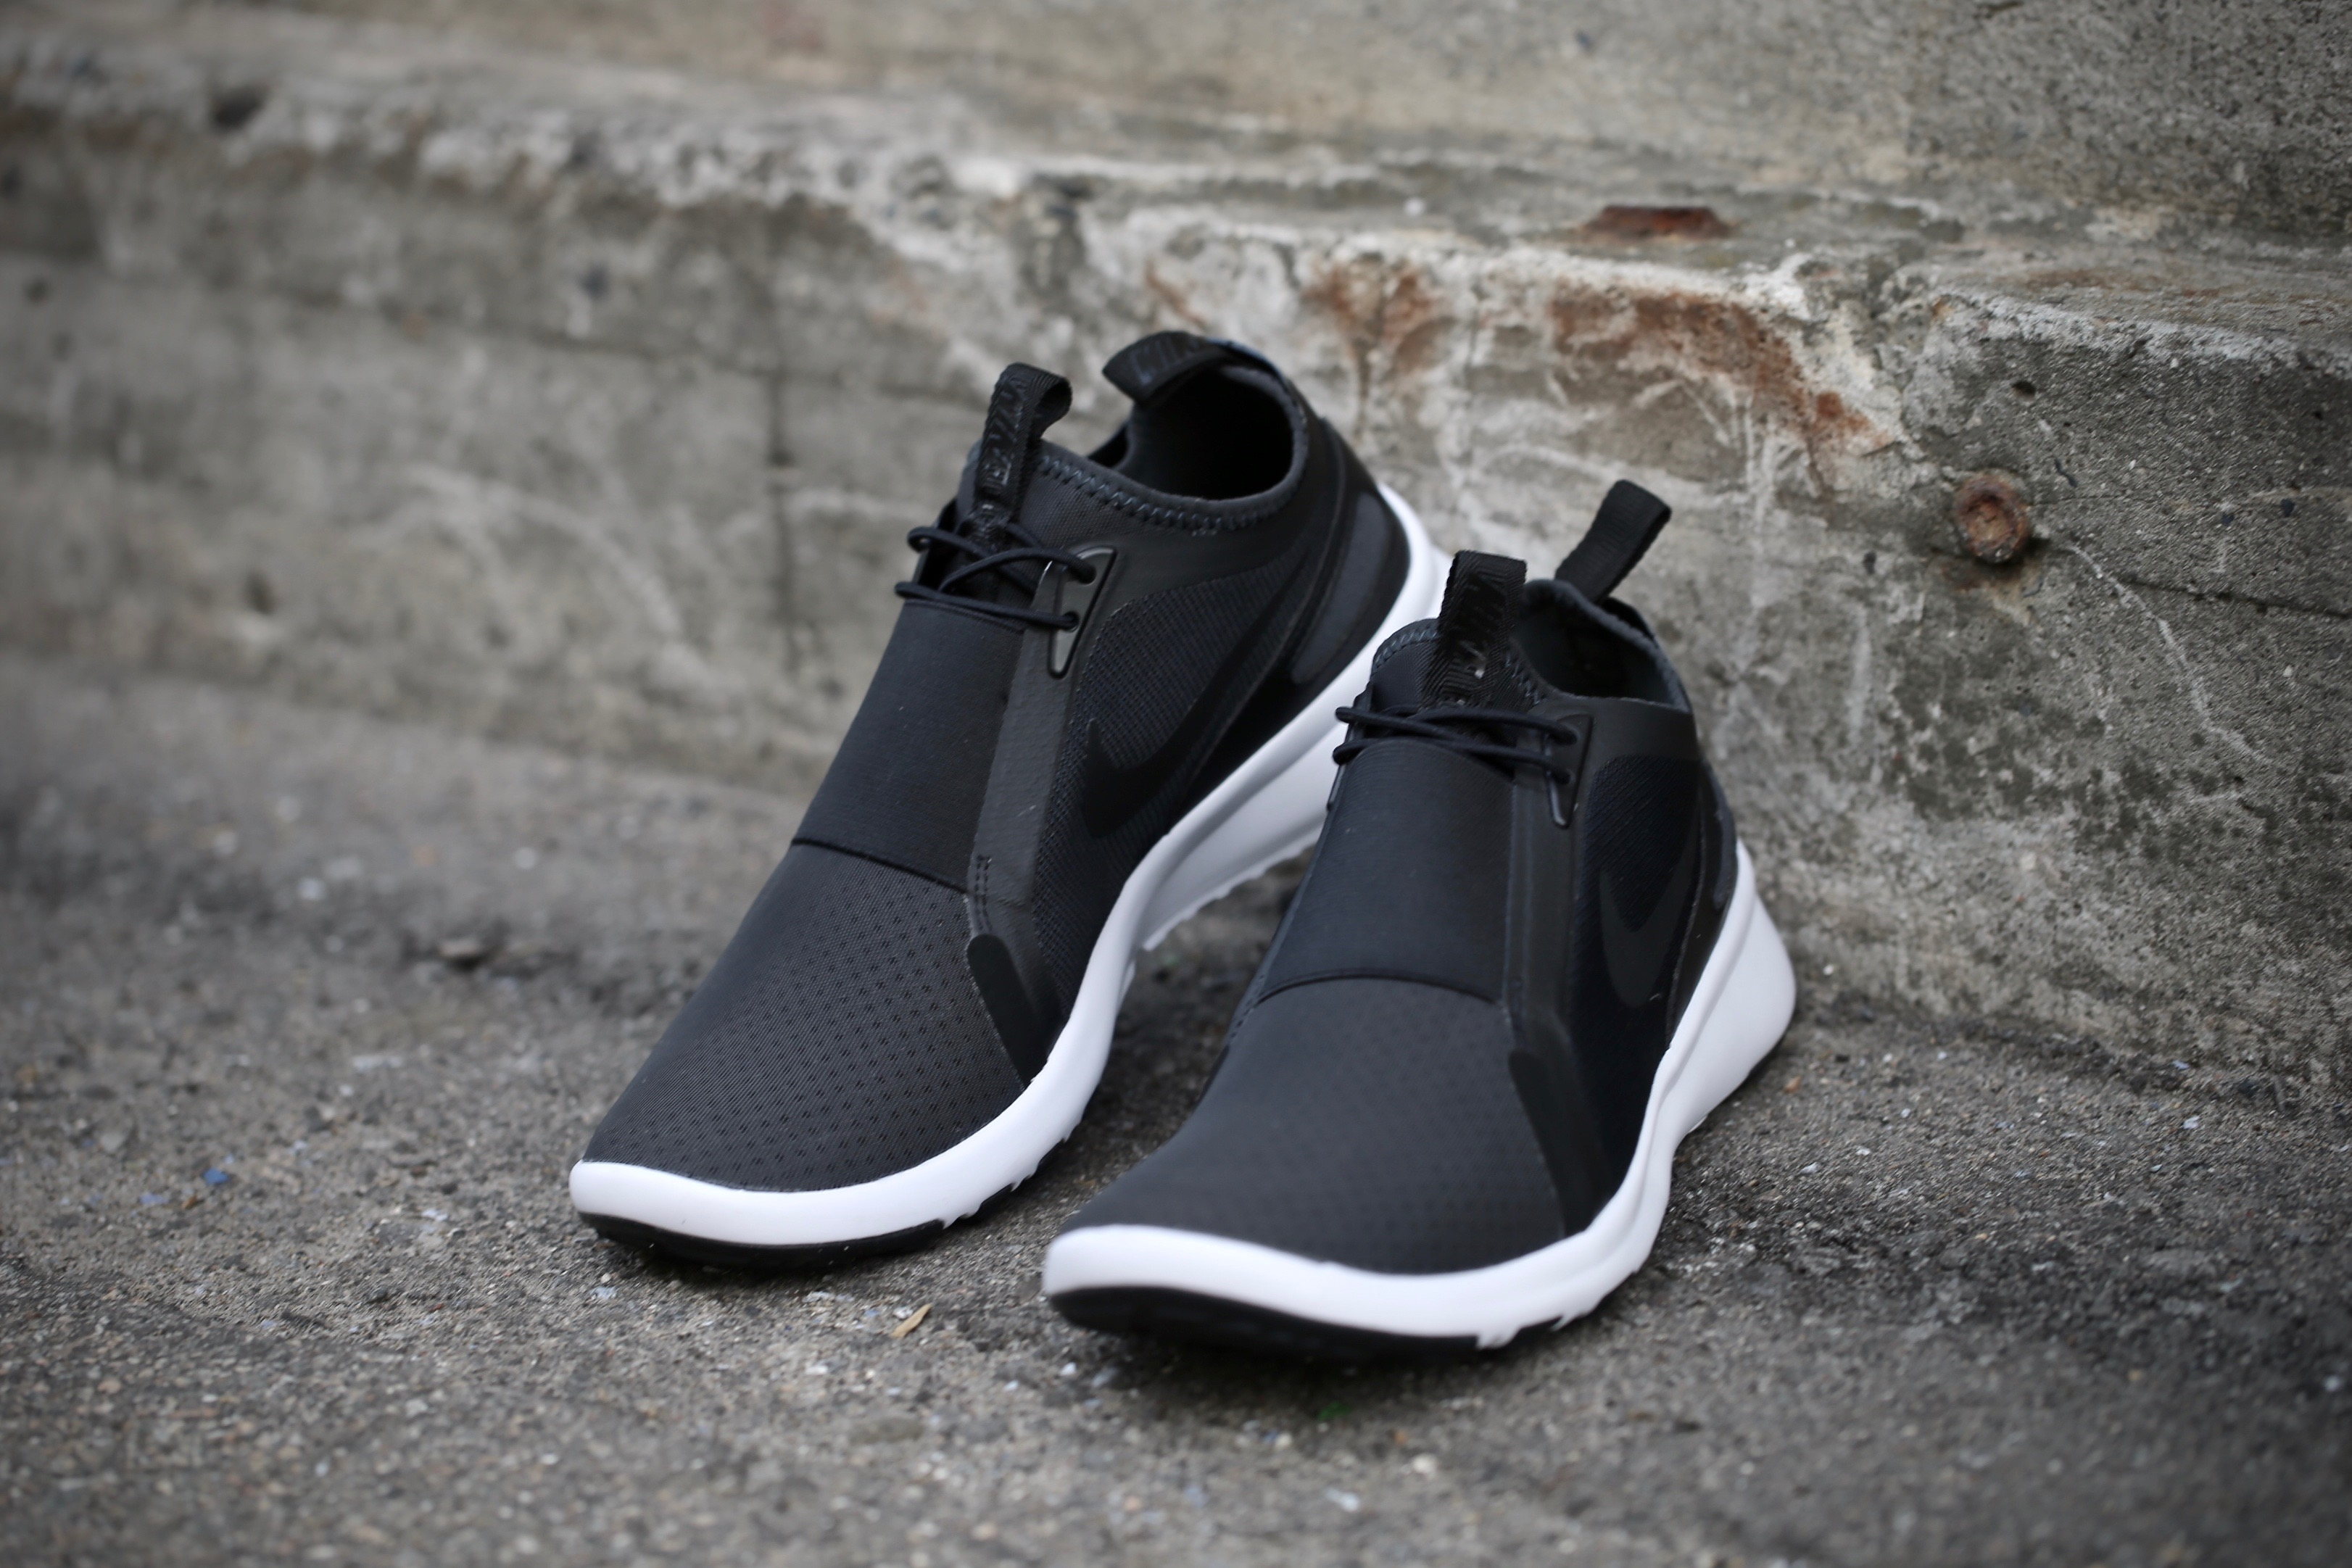 76302ed83e3d Nike Current Slip On – Black   Black   Anthracite – STASP